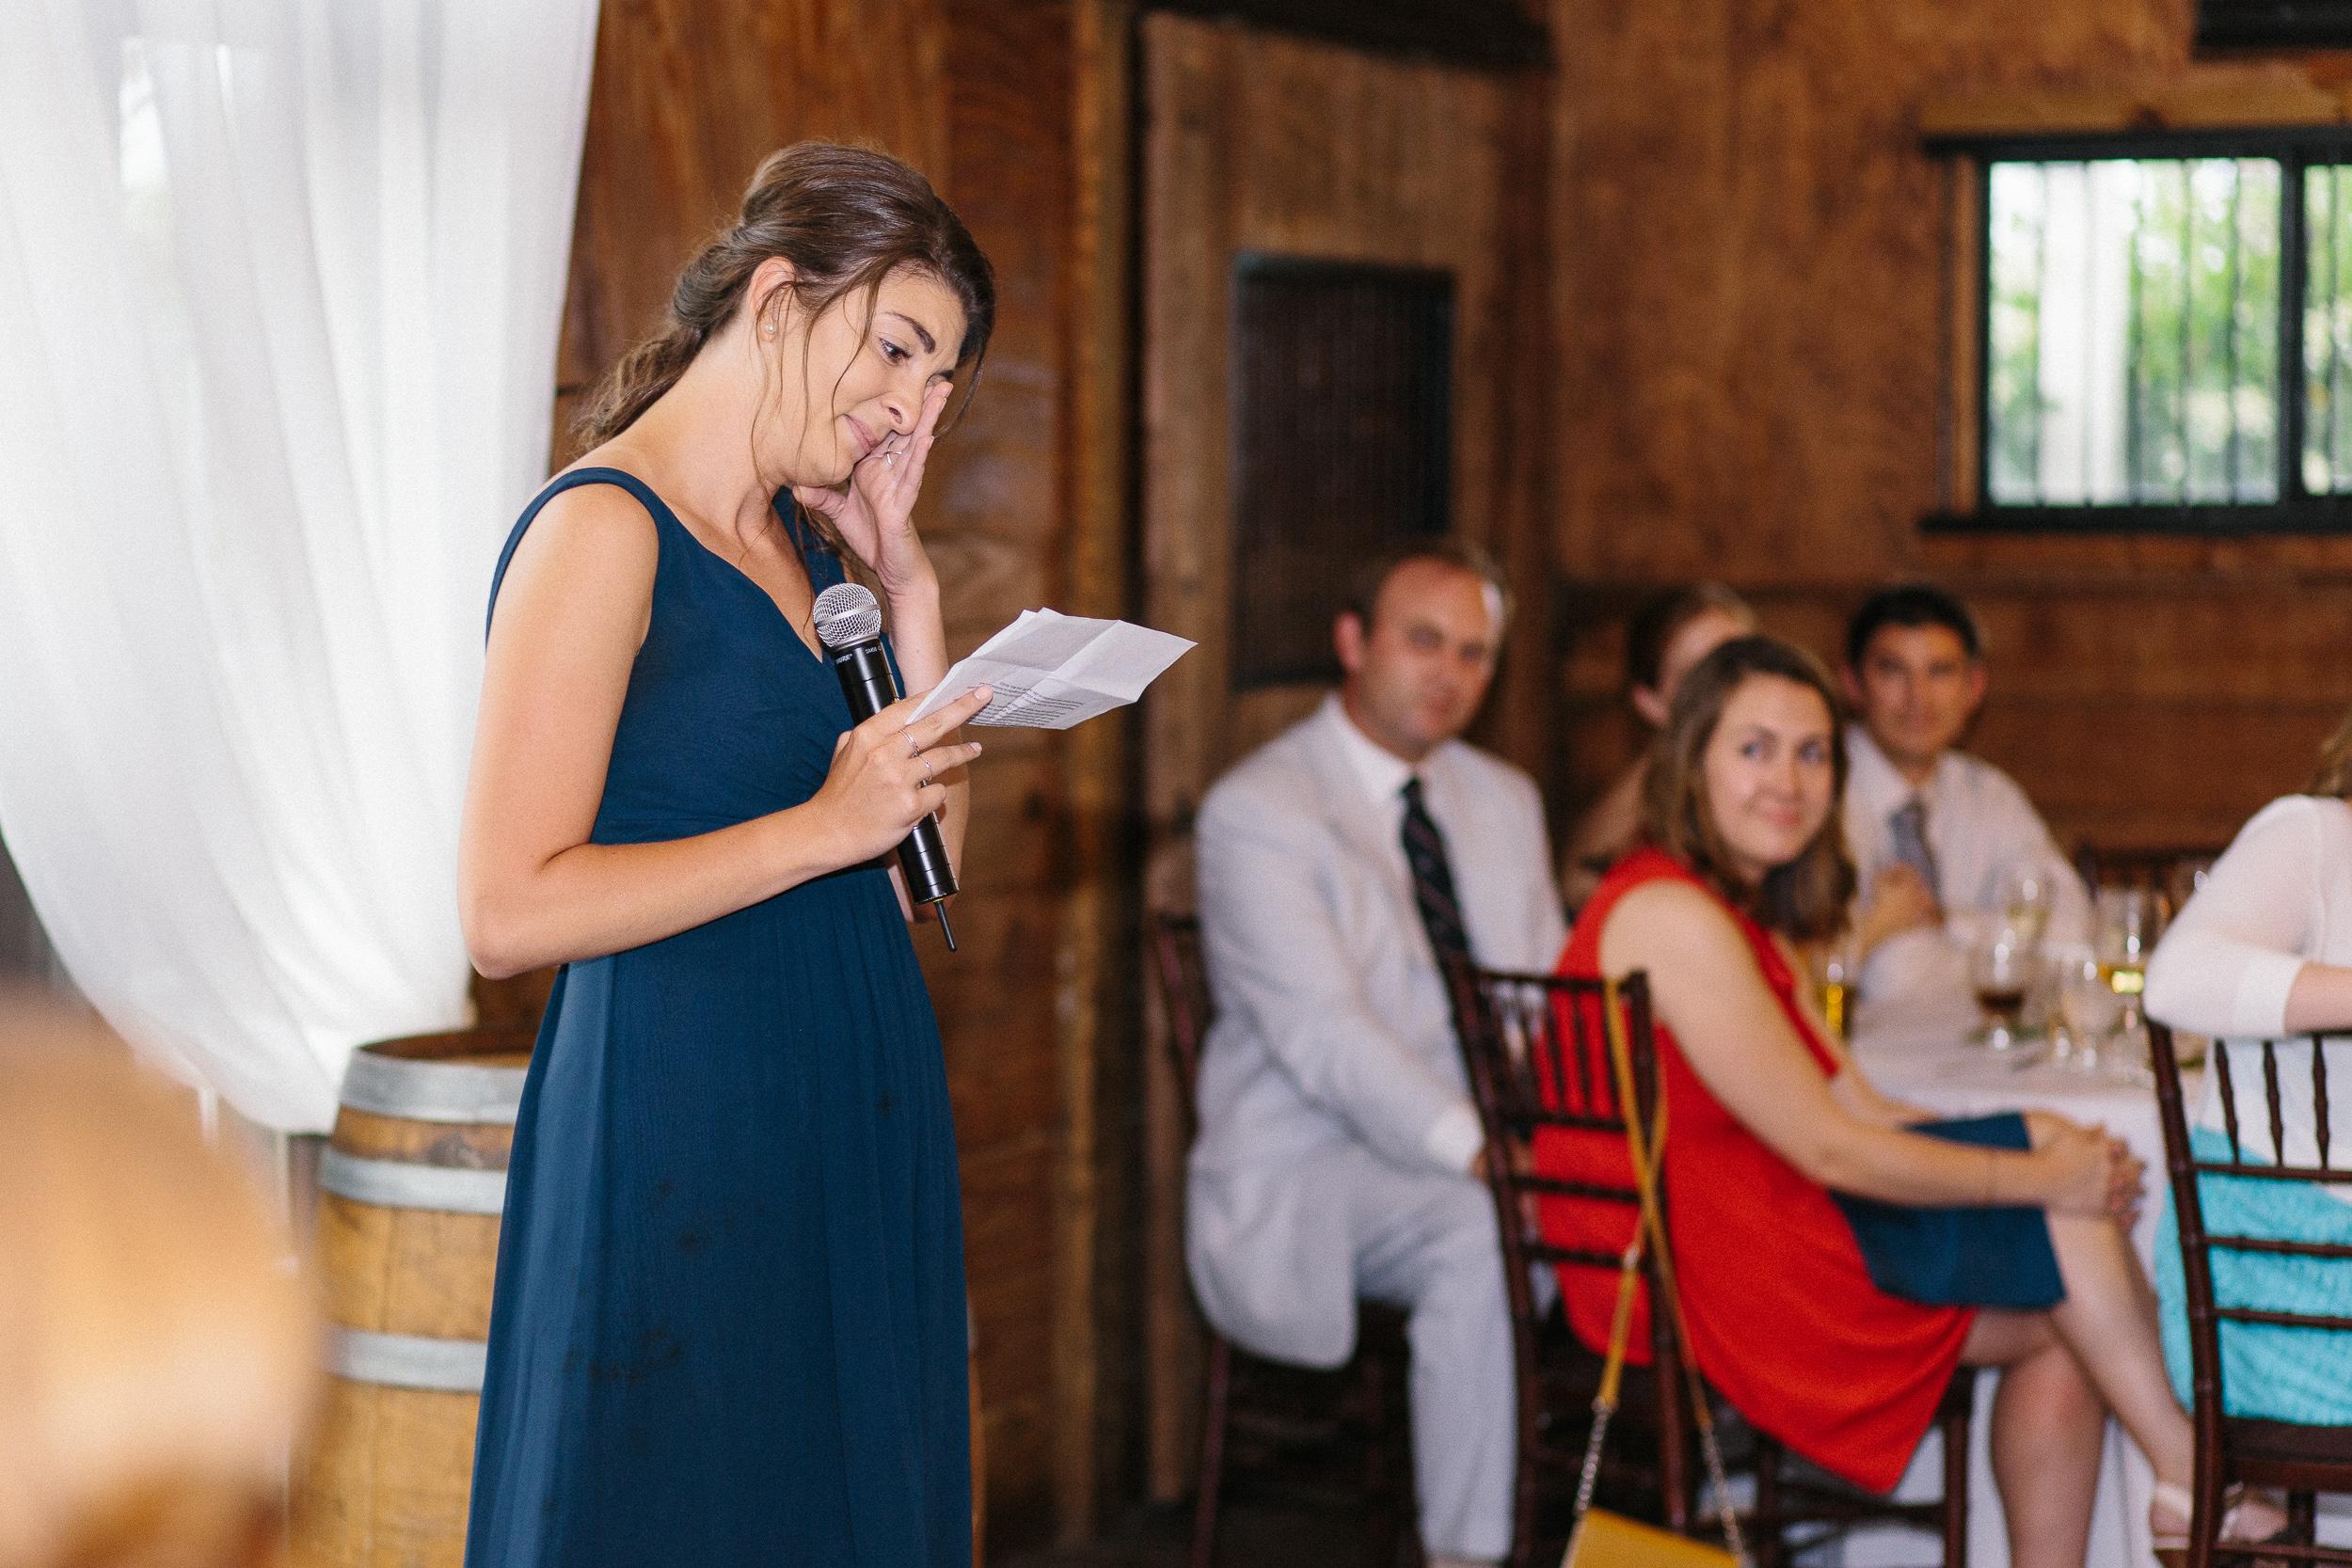 sweet-bridesmaid-toast-to-wedding-couple